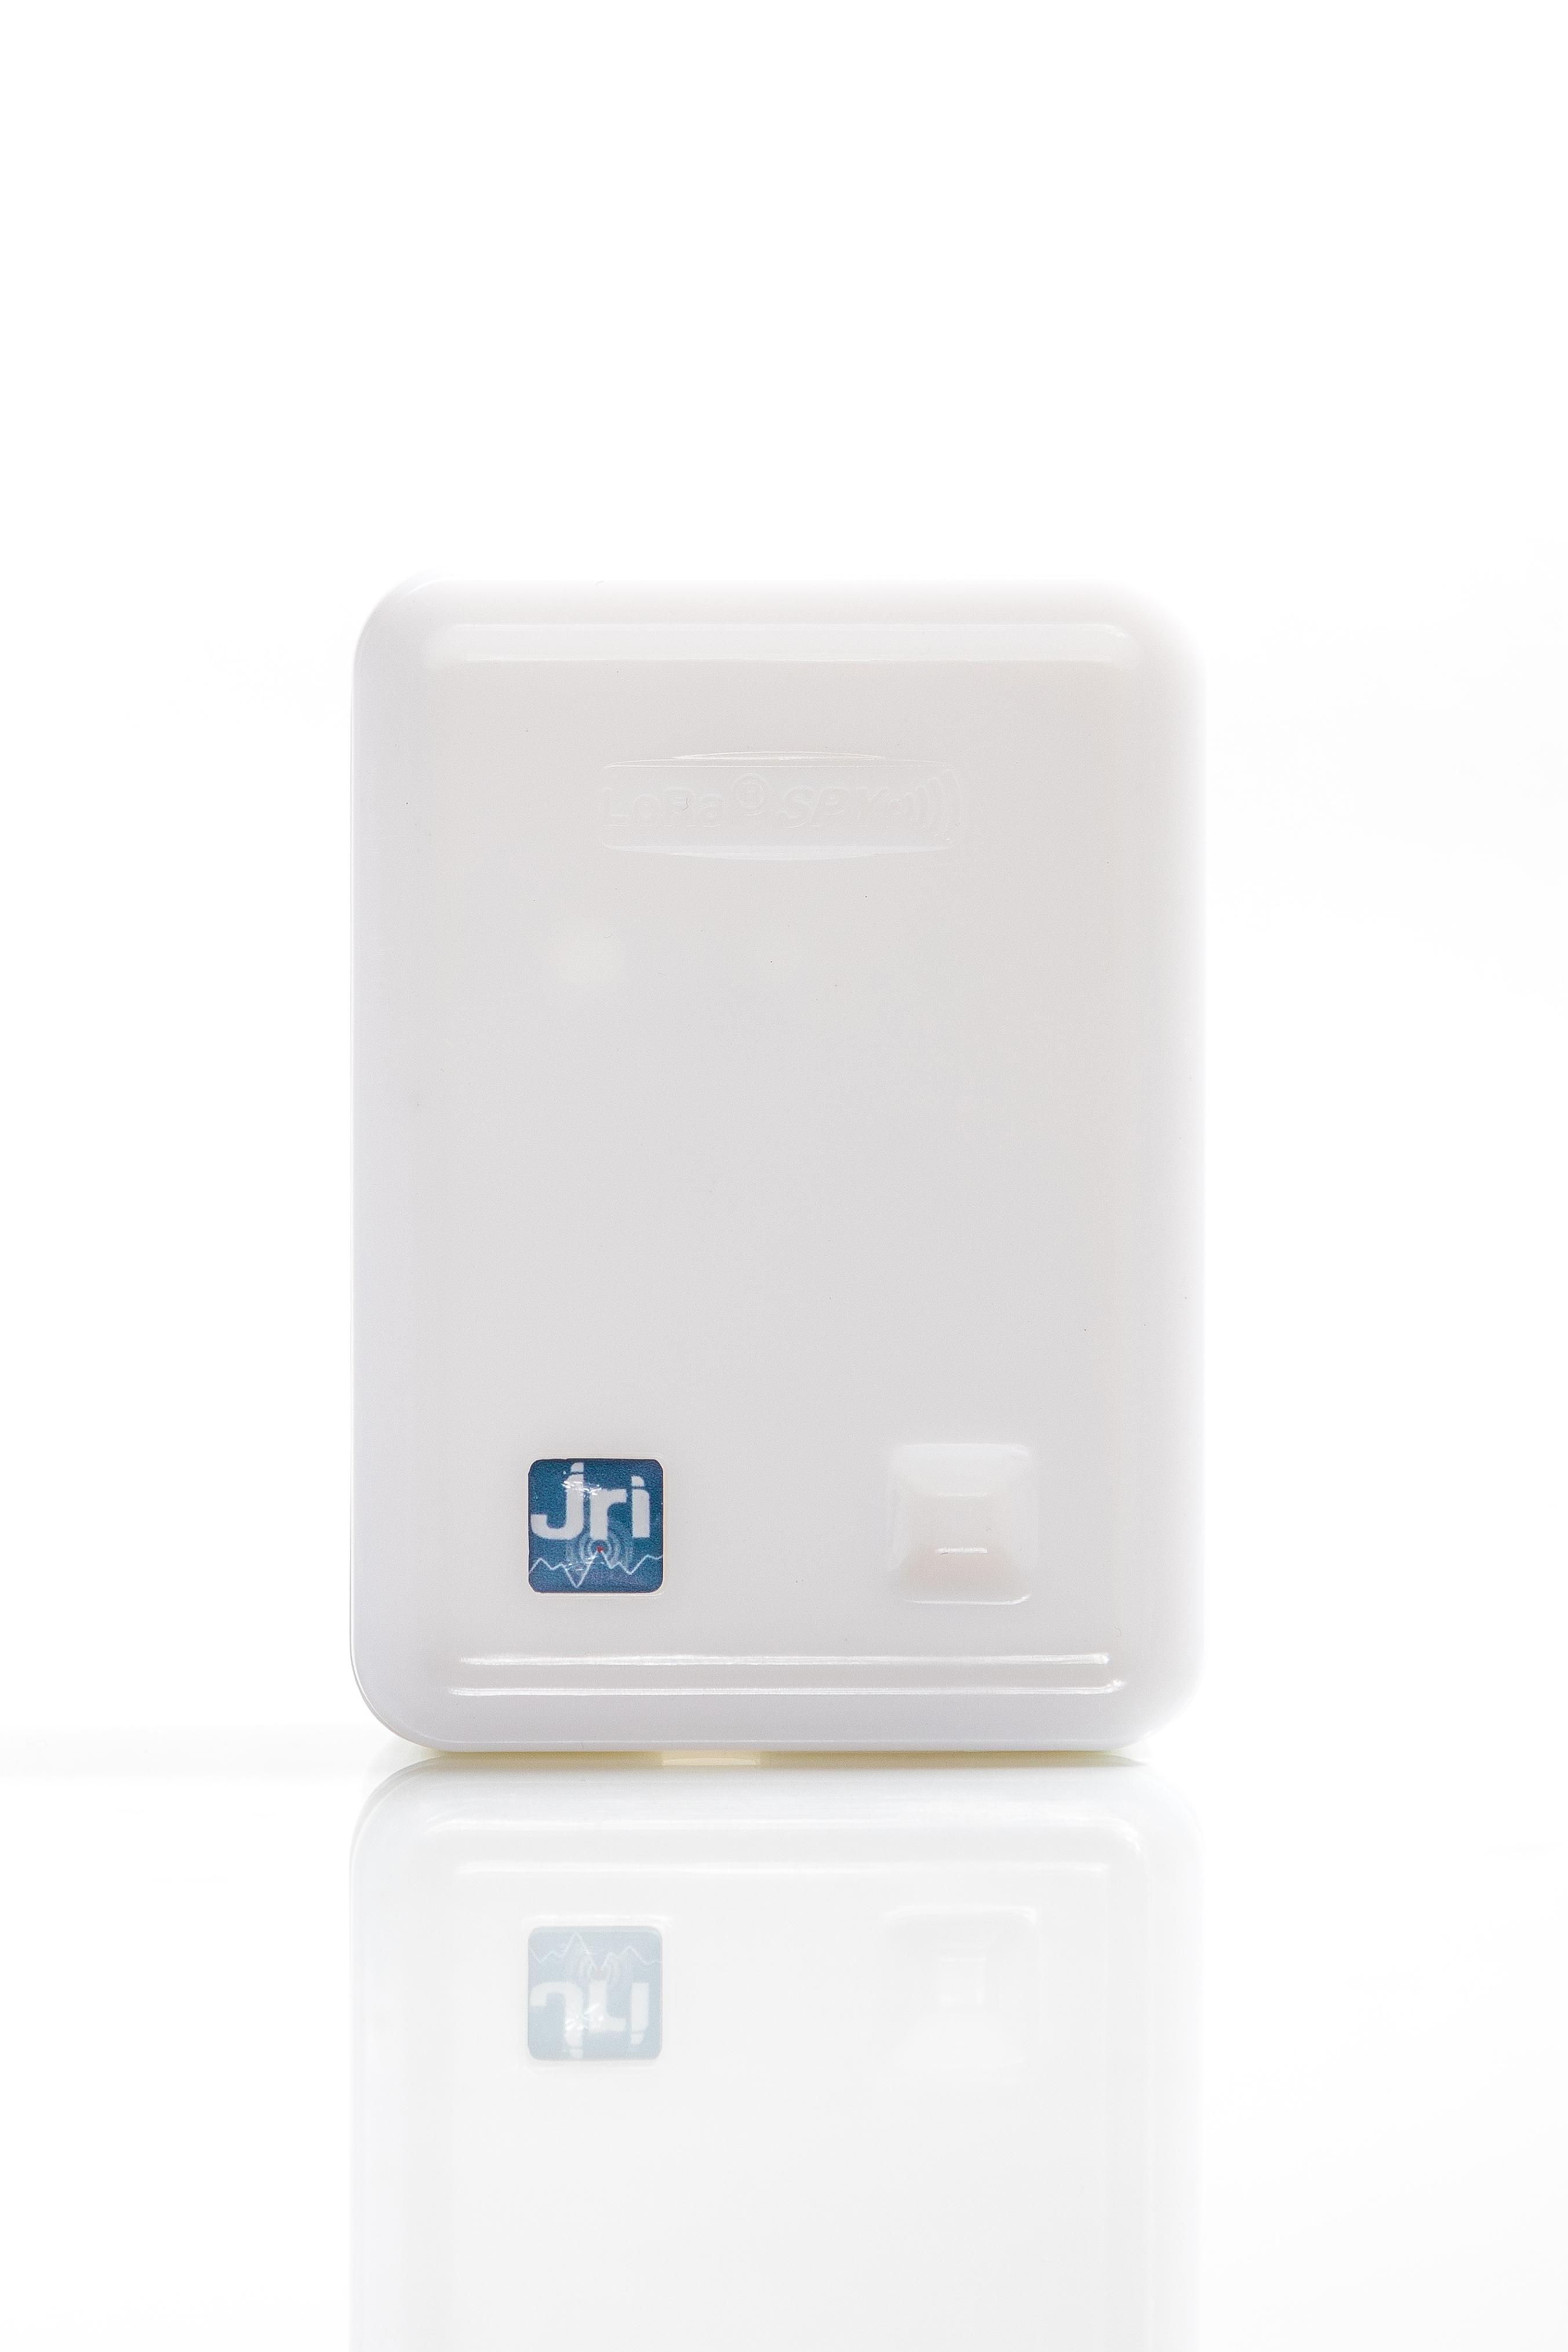 Sistem de monitorizare temperatura sau temperatura si umiditate